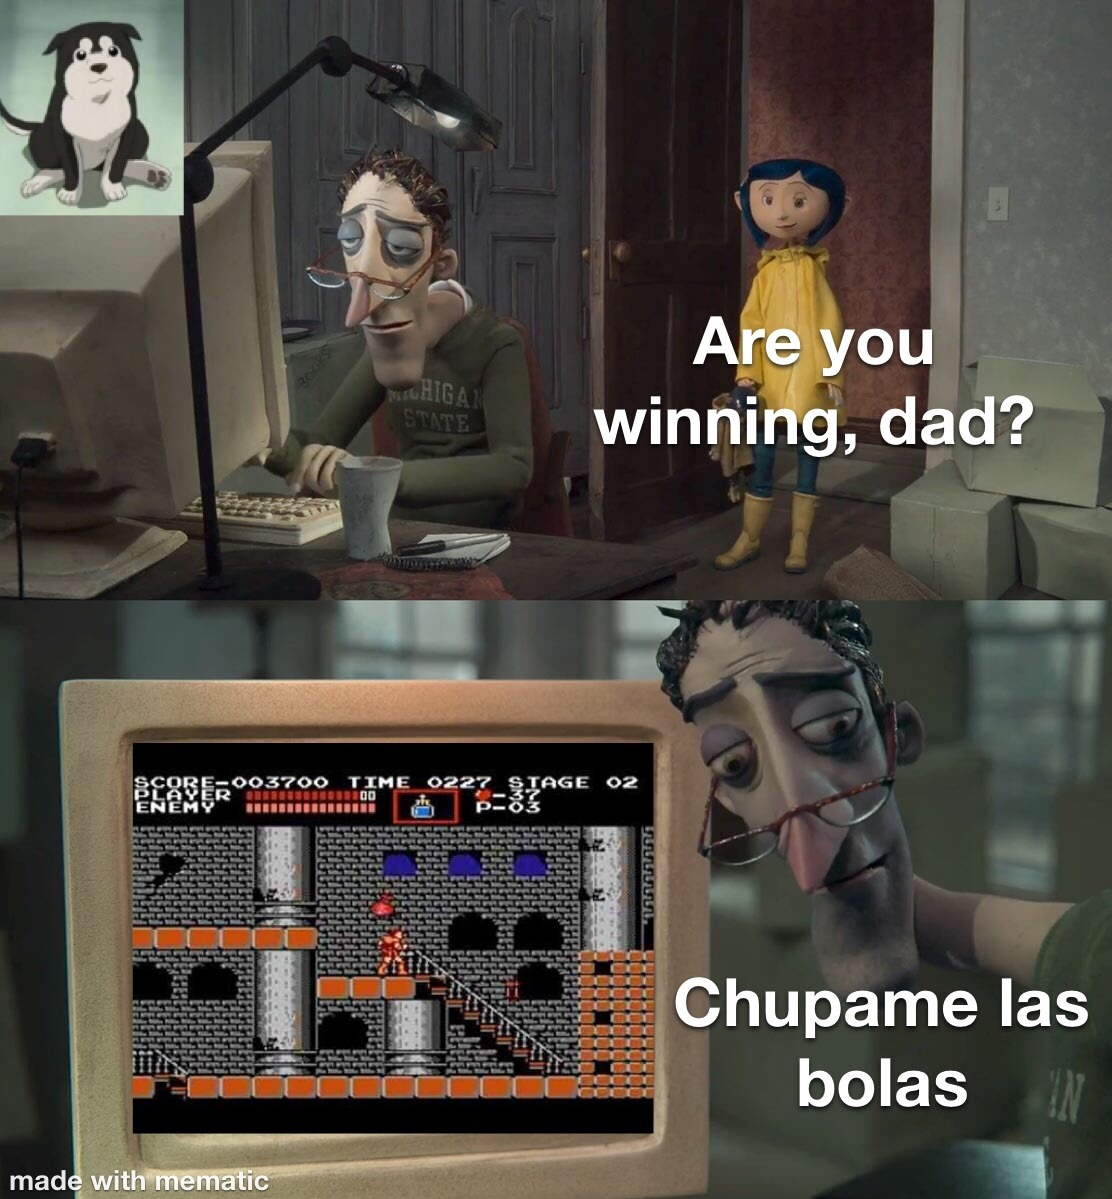 pinche castlevania, buen juego, pero jodidamente difícil - meme